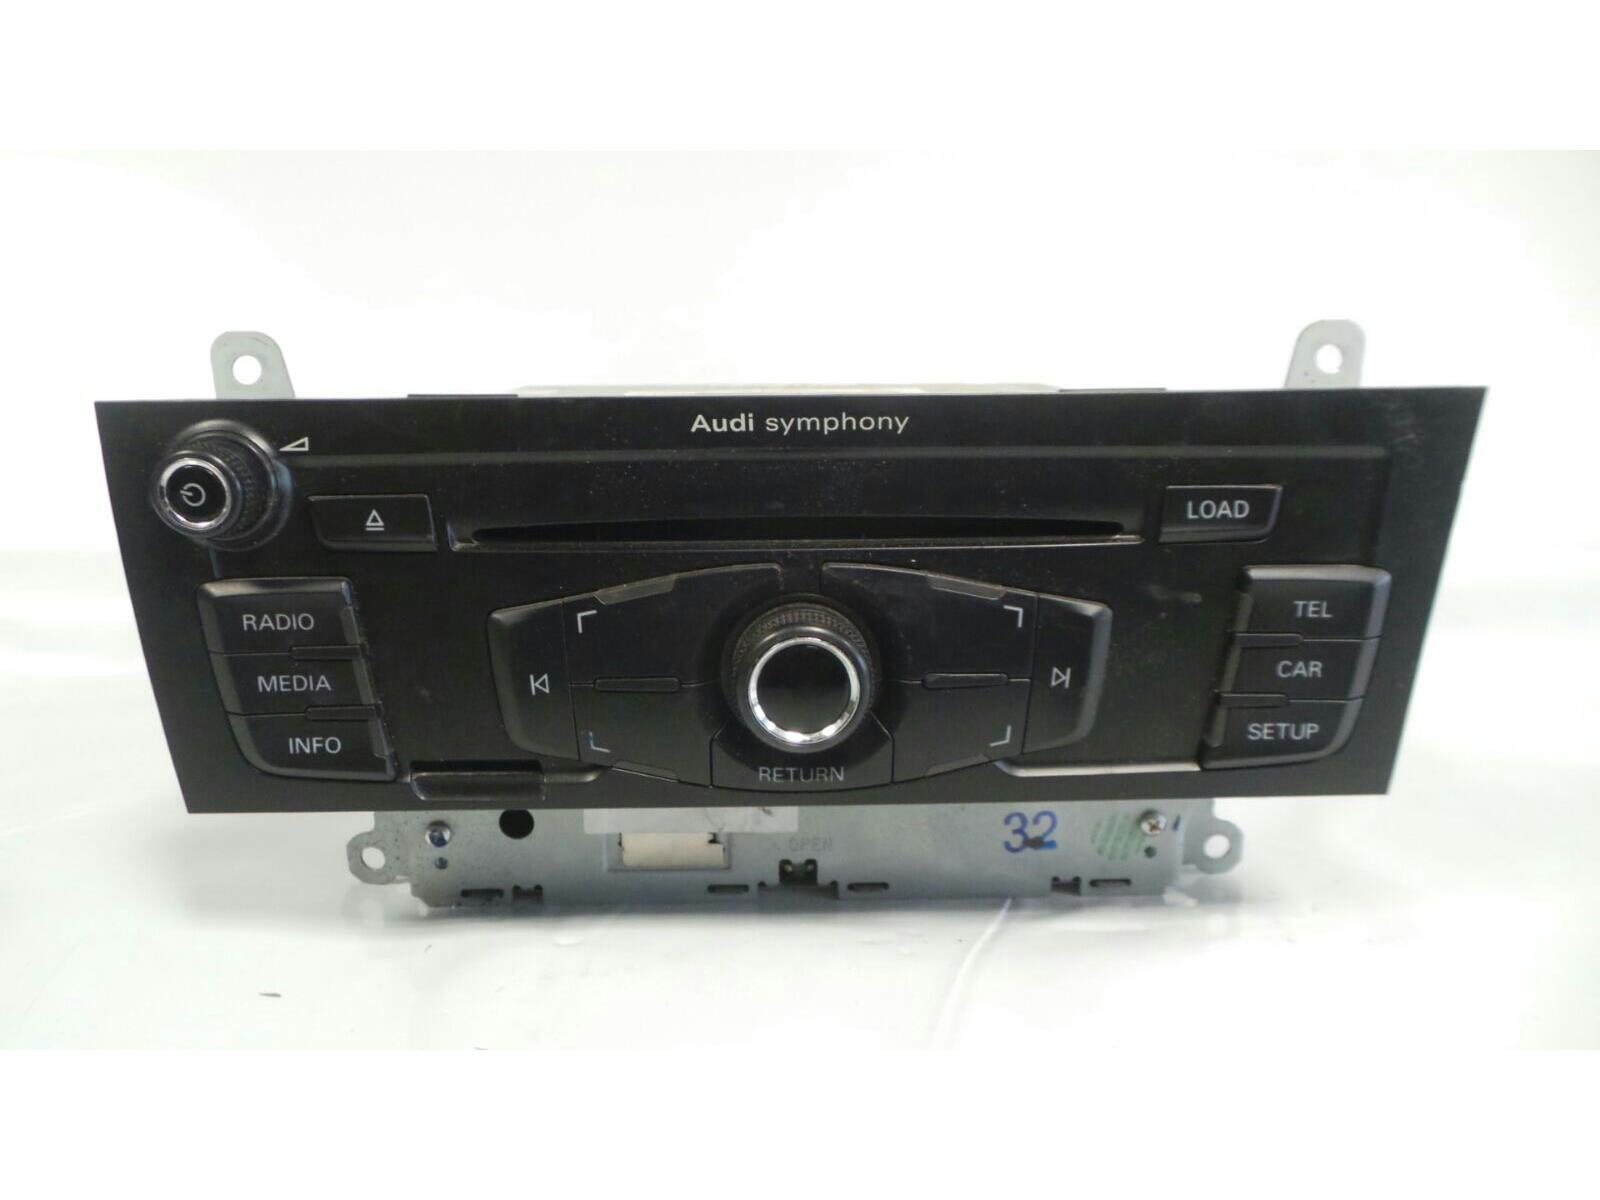 Audi Multimedia Untested May Need Coding CD/Radio 8T2 035 195 AA